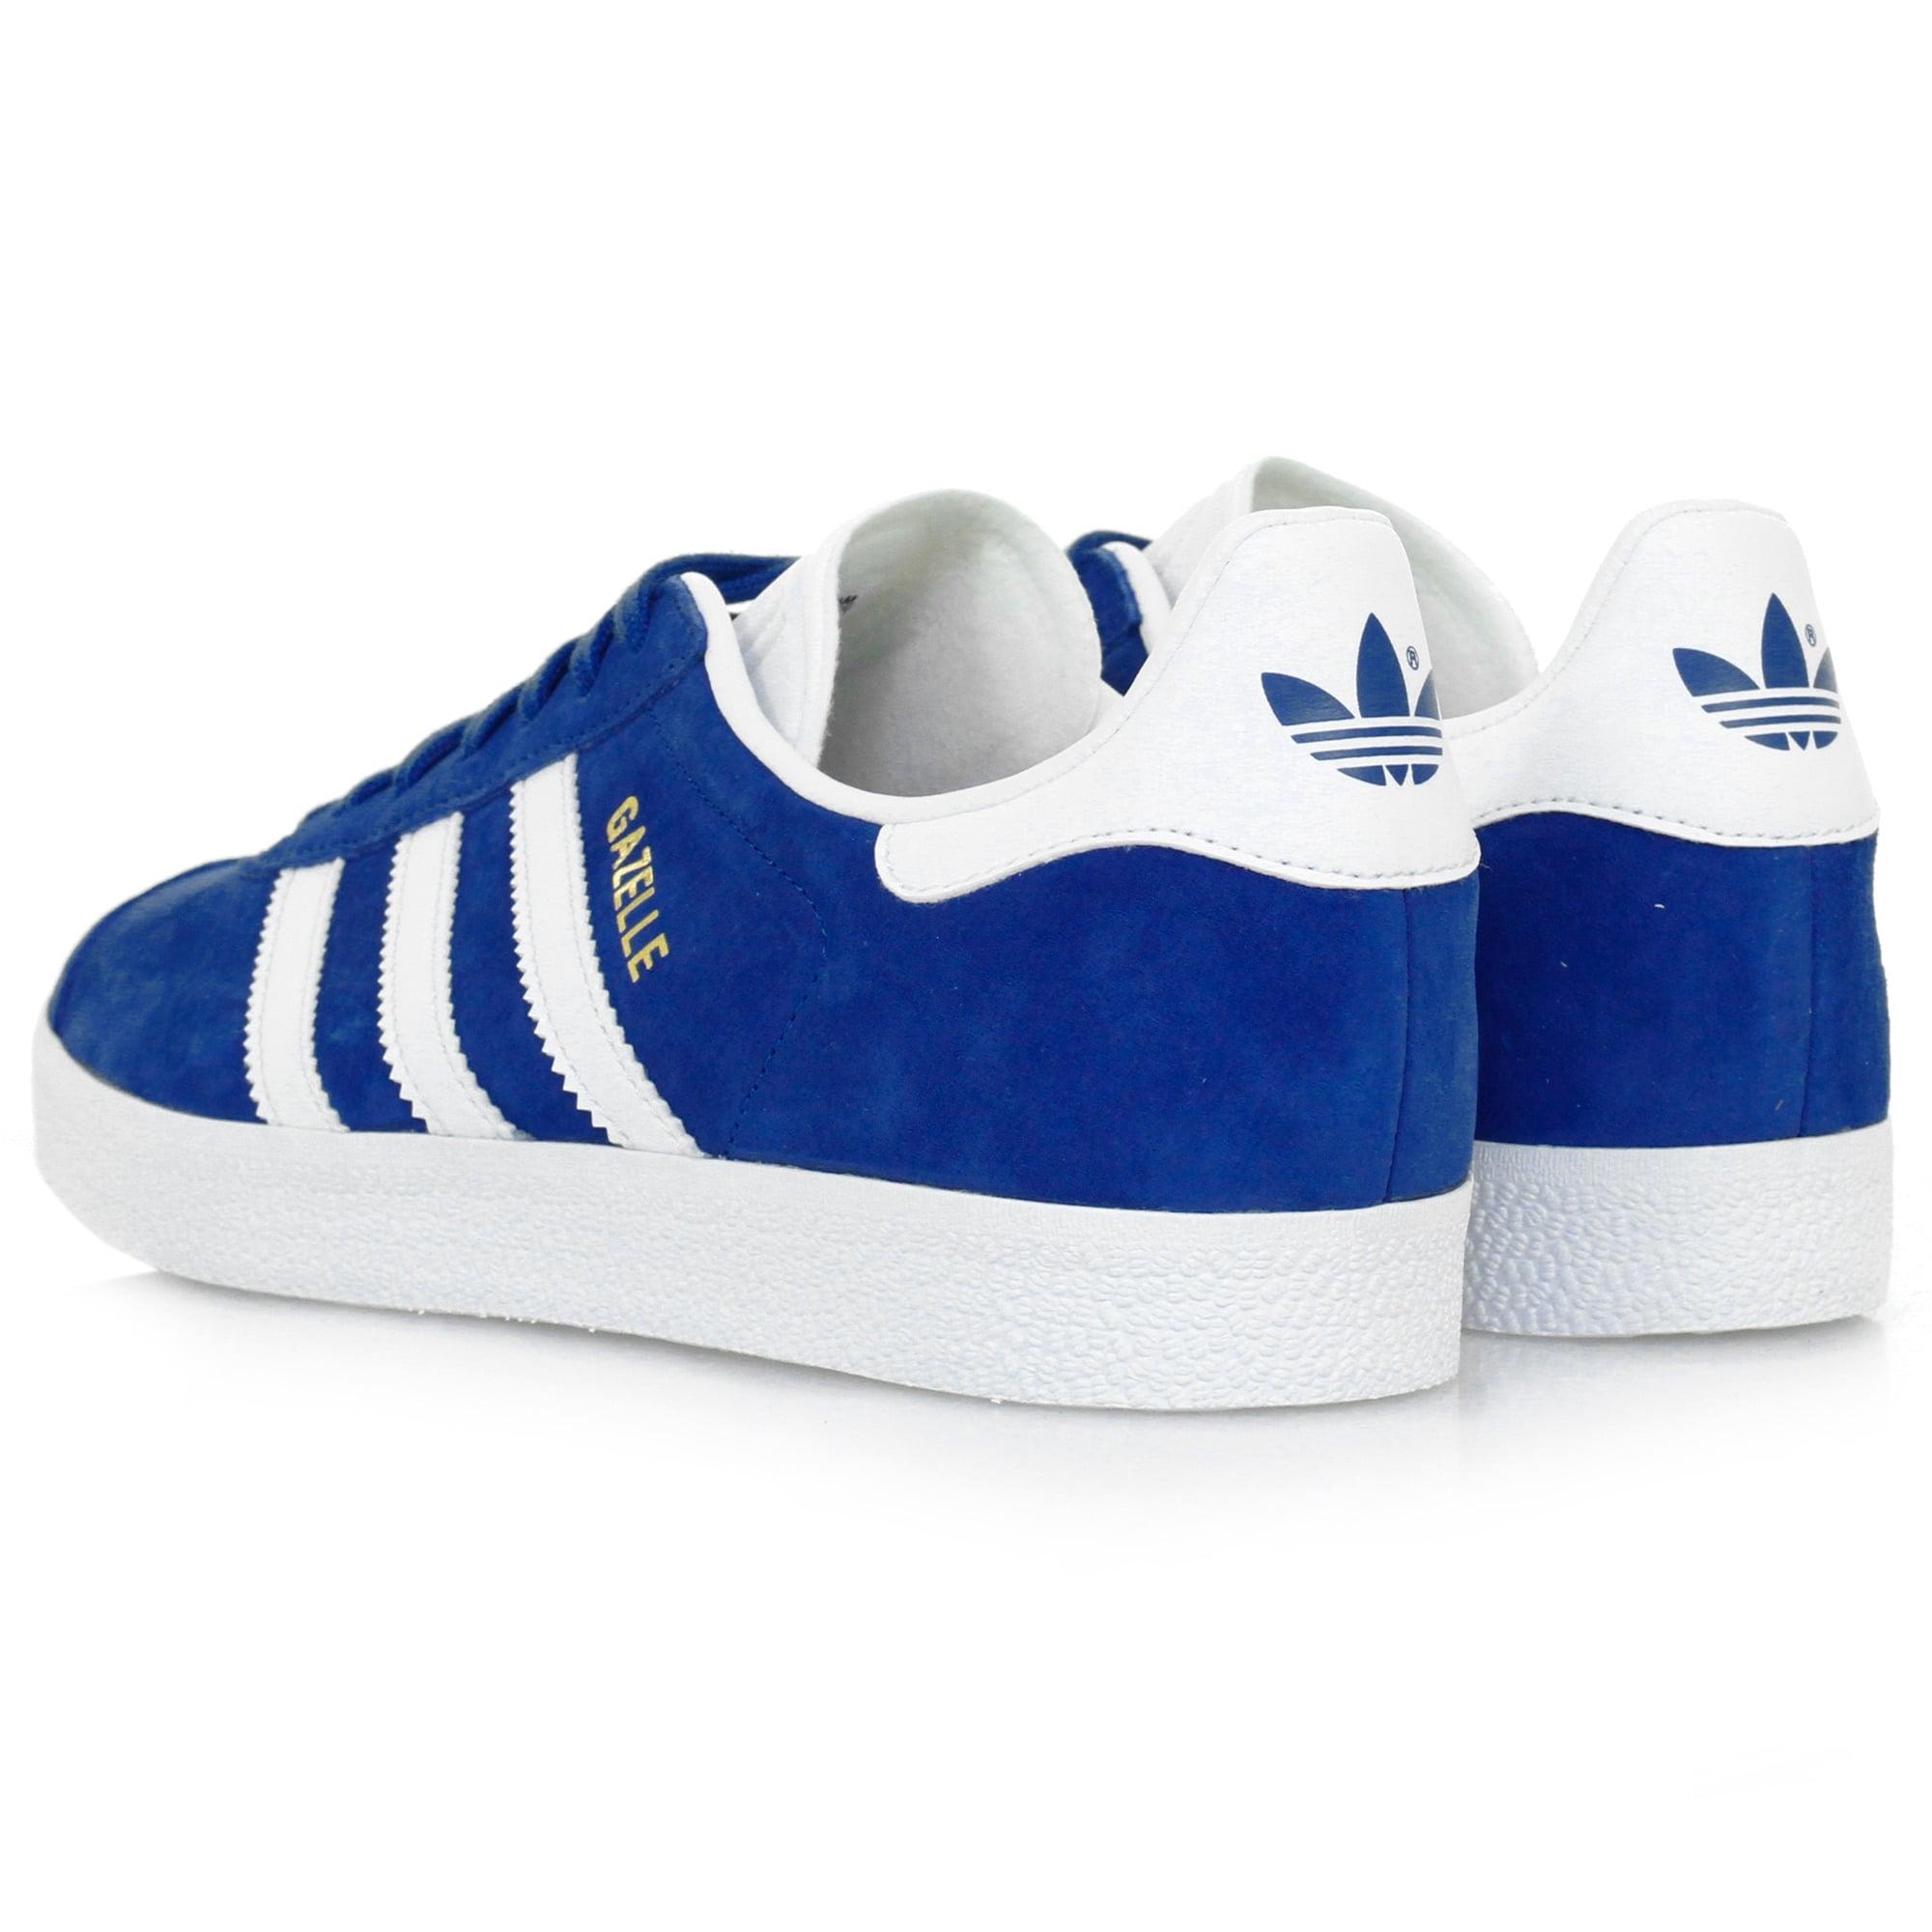 Adidas Originals Gazelle Royal Blue Suede Shoe S76227